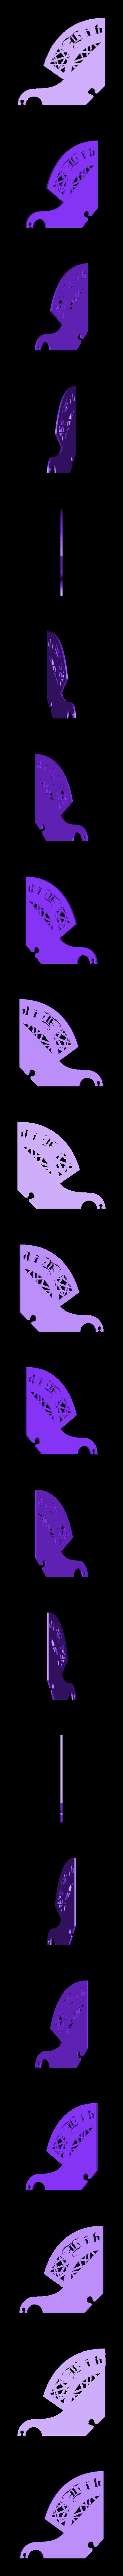 portomine_part_g_h_liberty01.STL Download STL file Portomine Liberty mirror & coat hooks • Model to 3D print, Tibe-Design